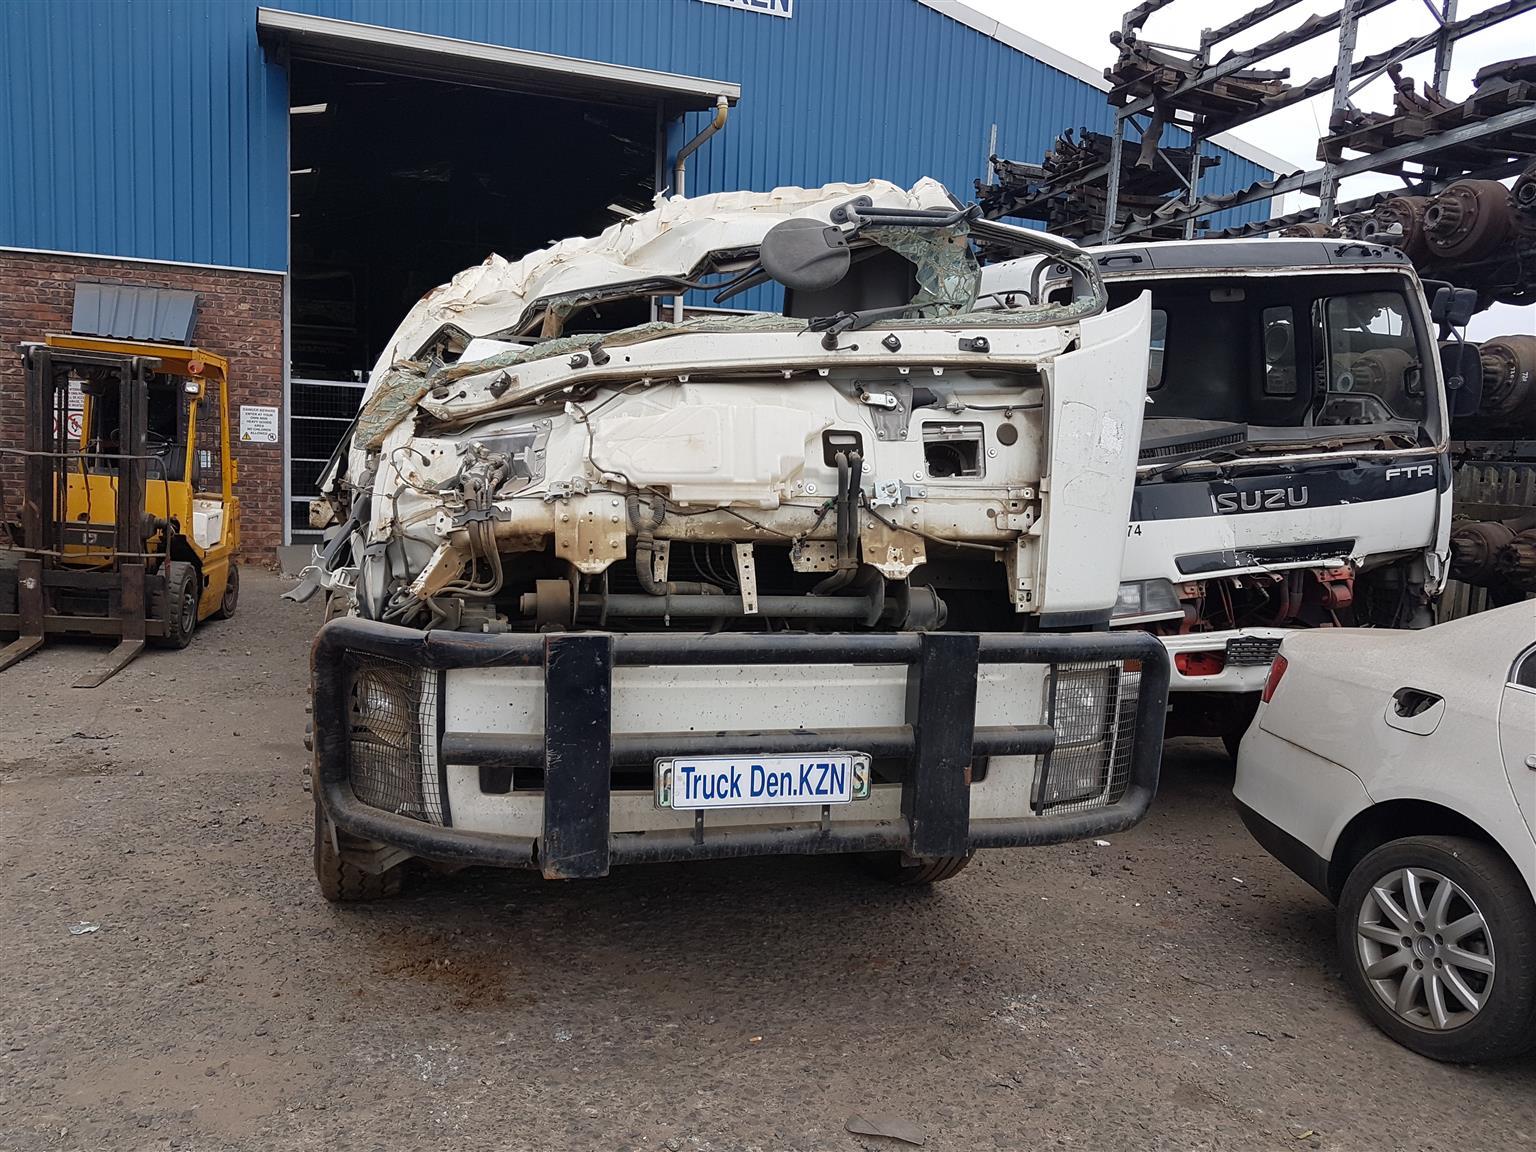 ISUZU FTR 850 AMT- Smoother Truck - Stripping for parts .